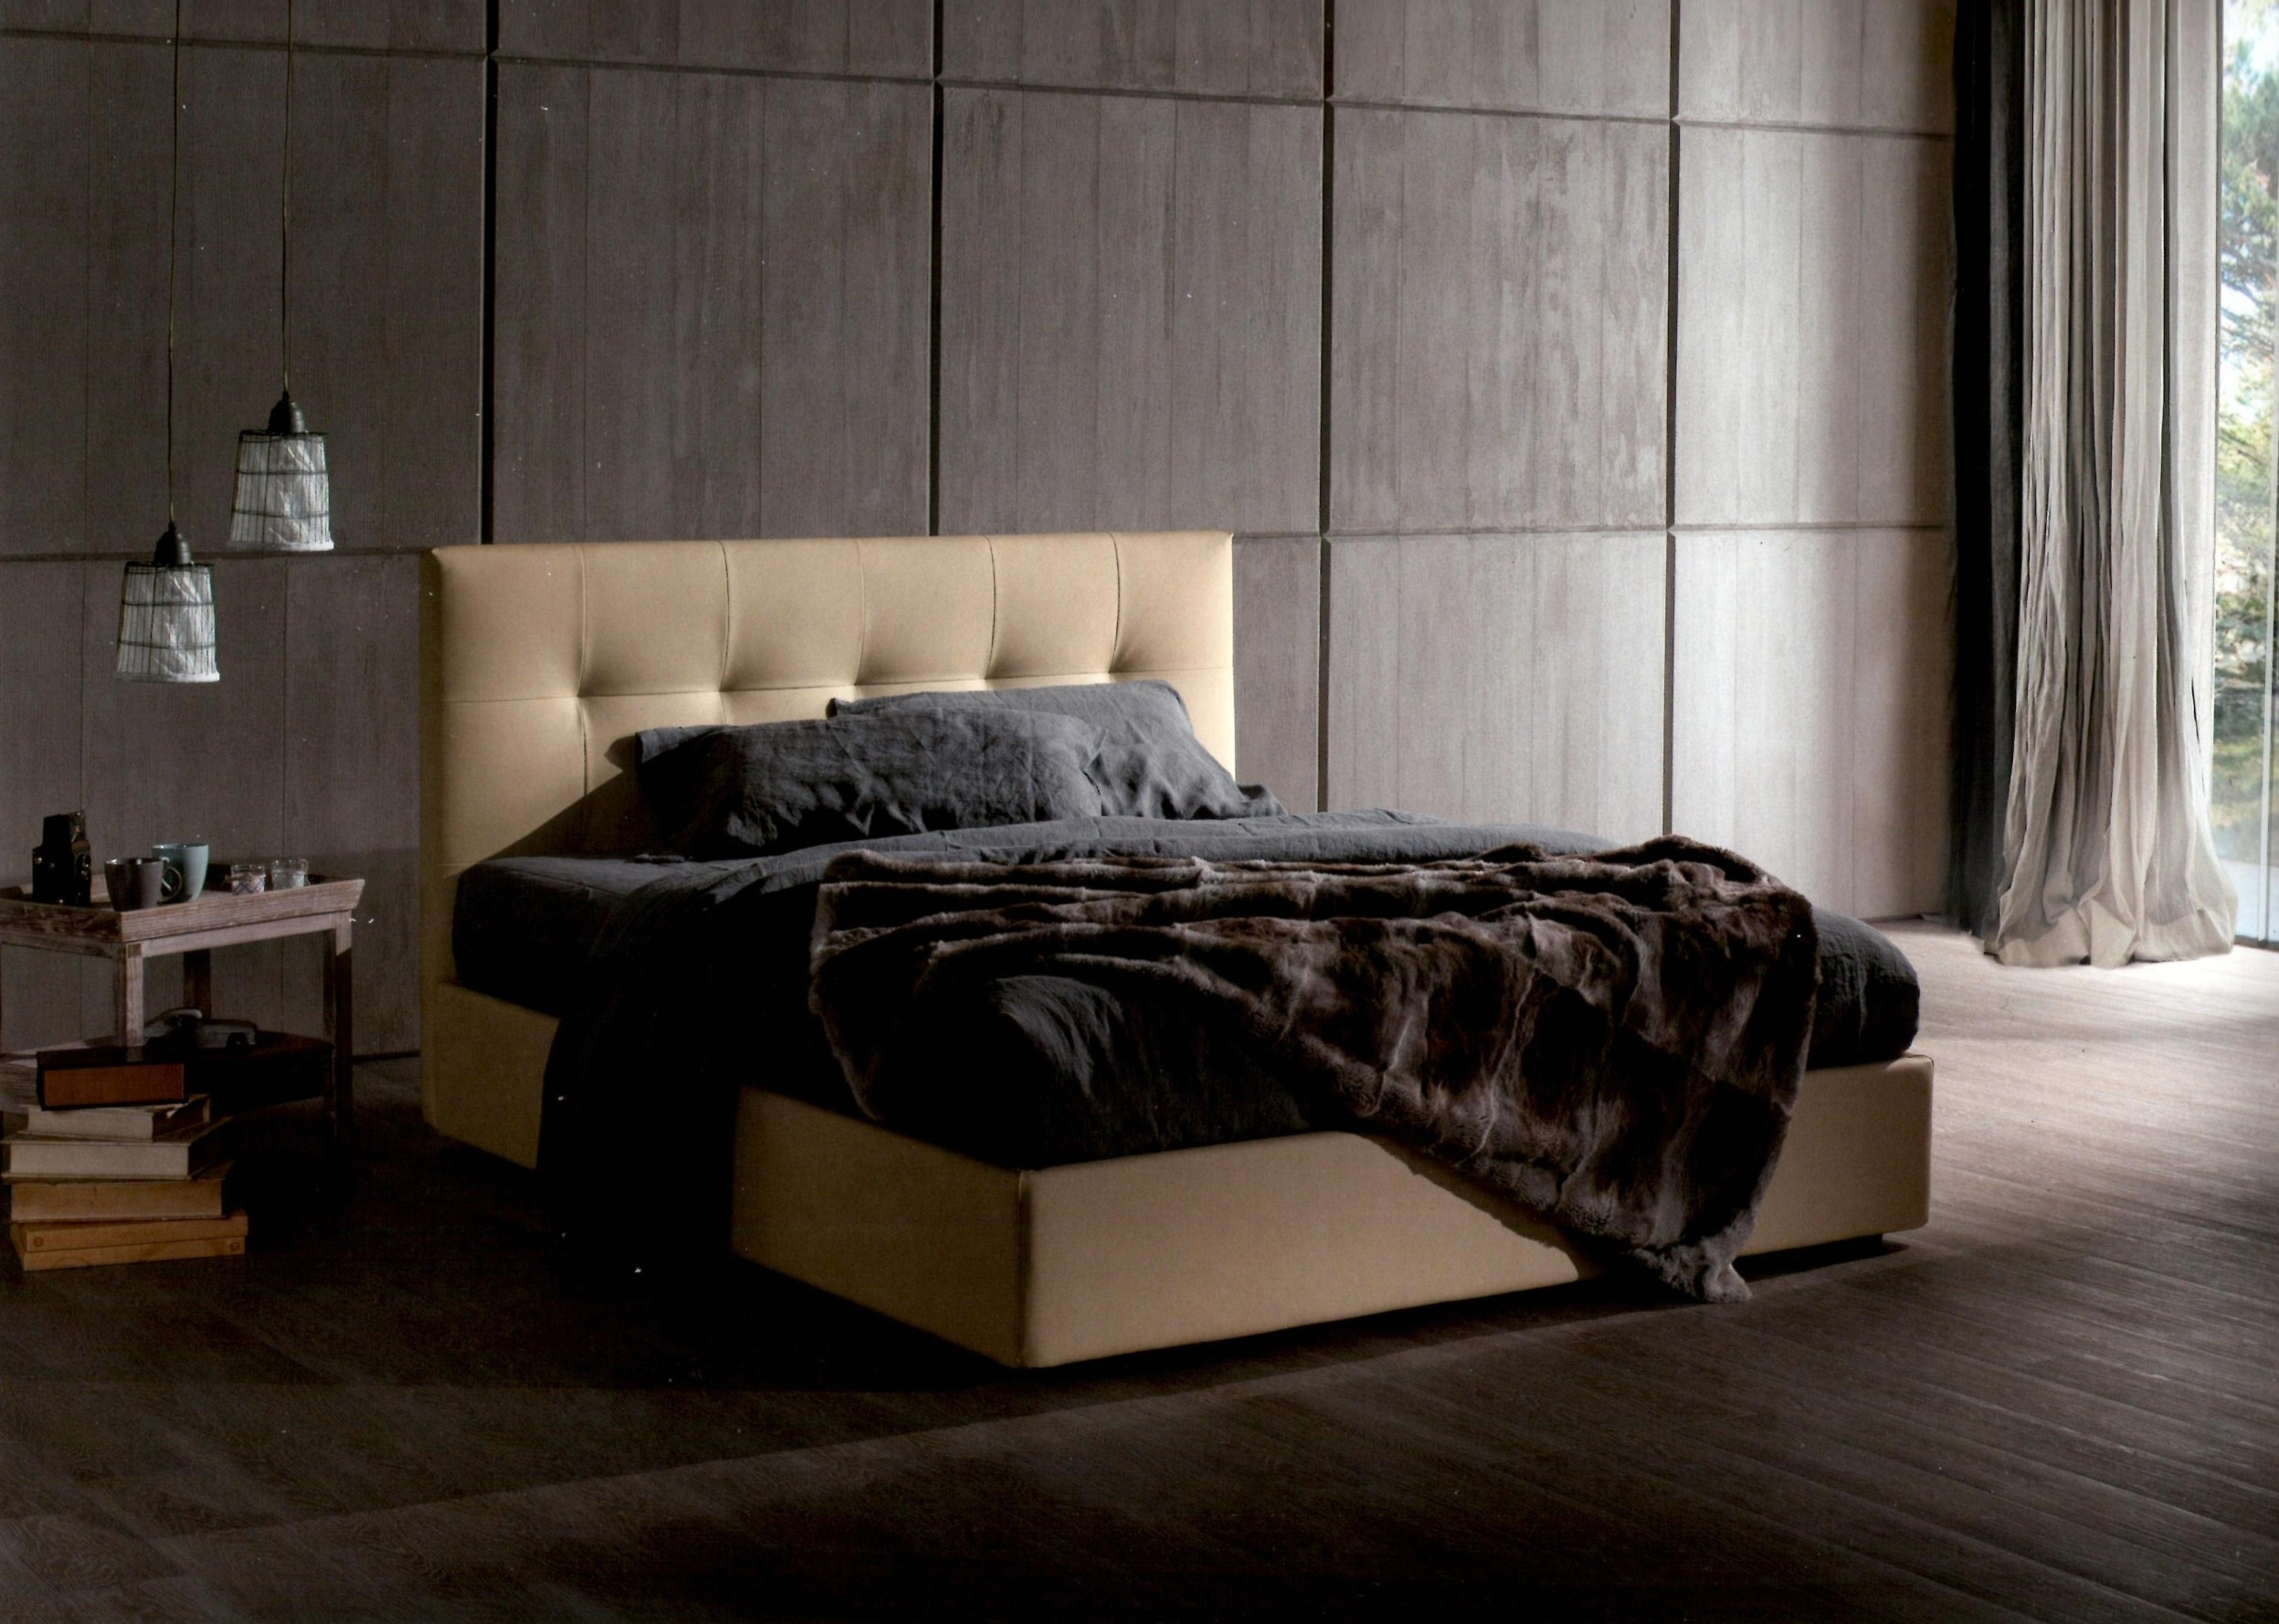 Letti A Baldacchino Ikea : Camere matrimoniali con letto a baldacchino design casa letti a